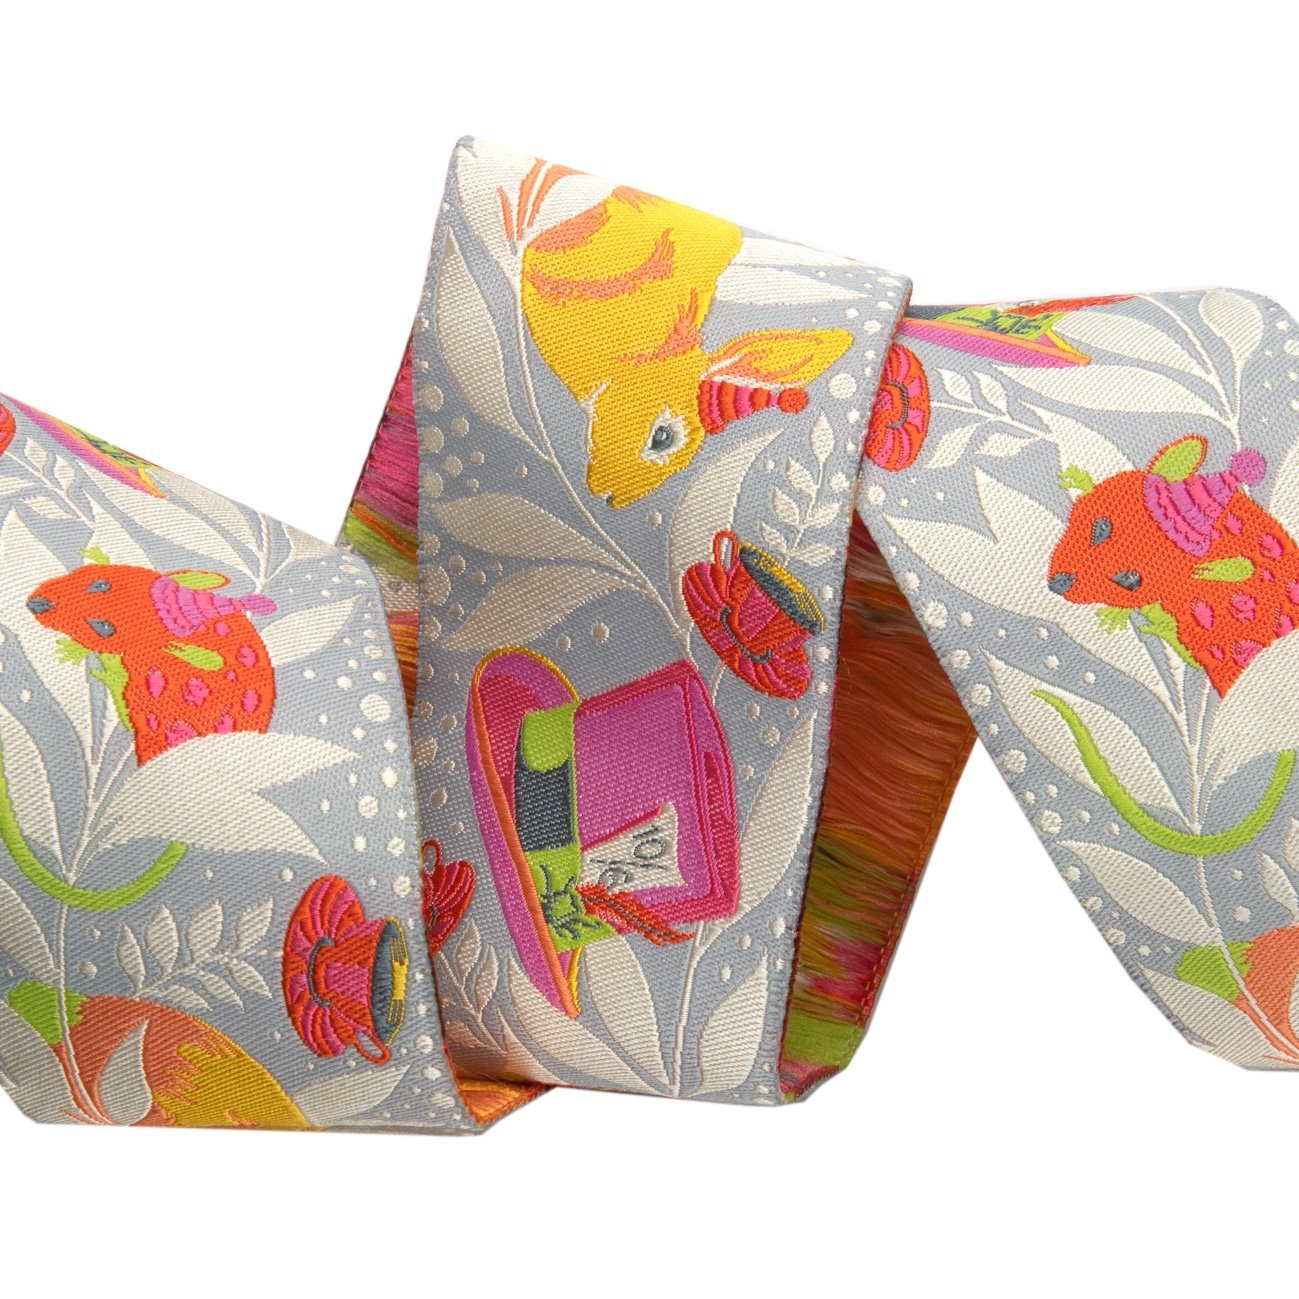 Renaissance Ribbons -Tula Pink Curiouser - Madhatter Pink-2